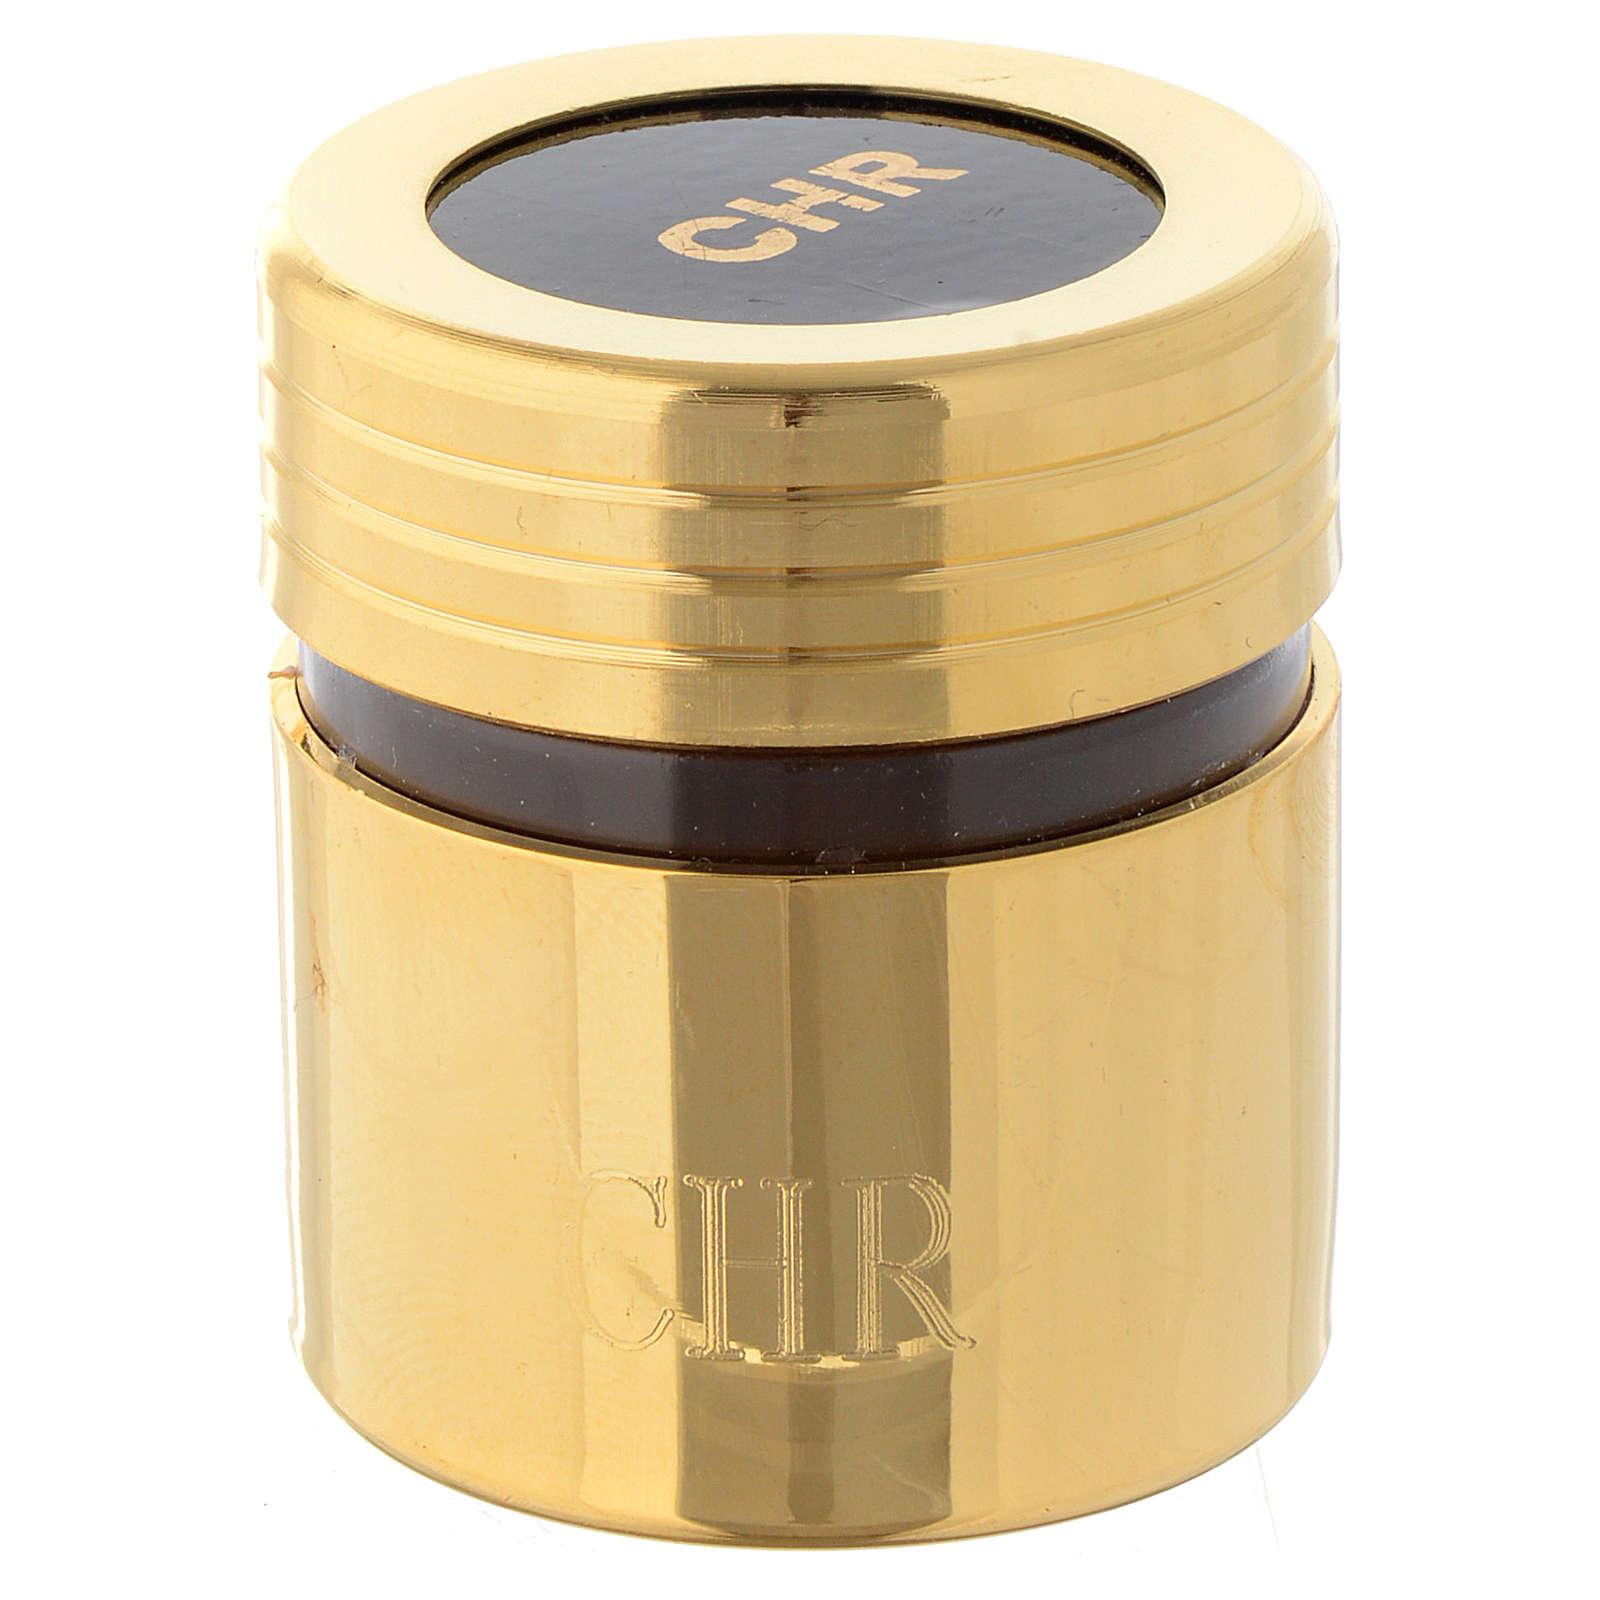 Ölgefäß aus Kunststoff mit vergoldeter Messing-Ummantelung Chrisam 3